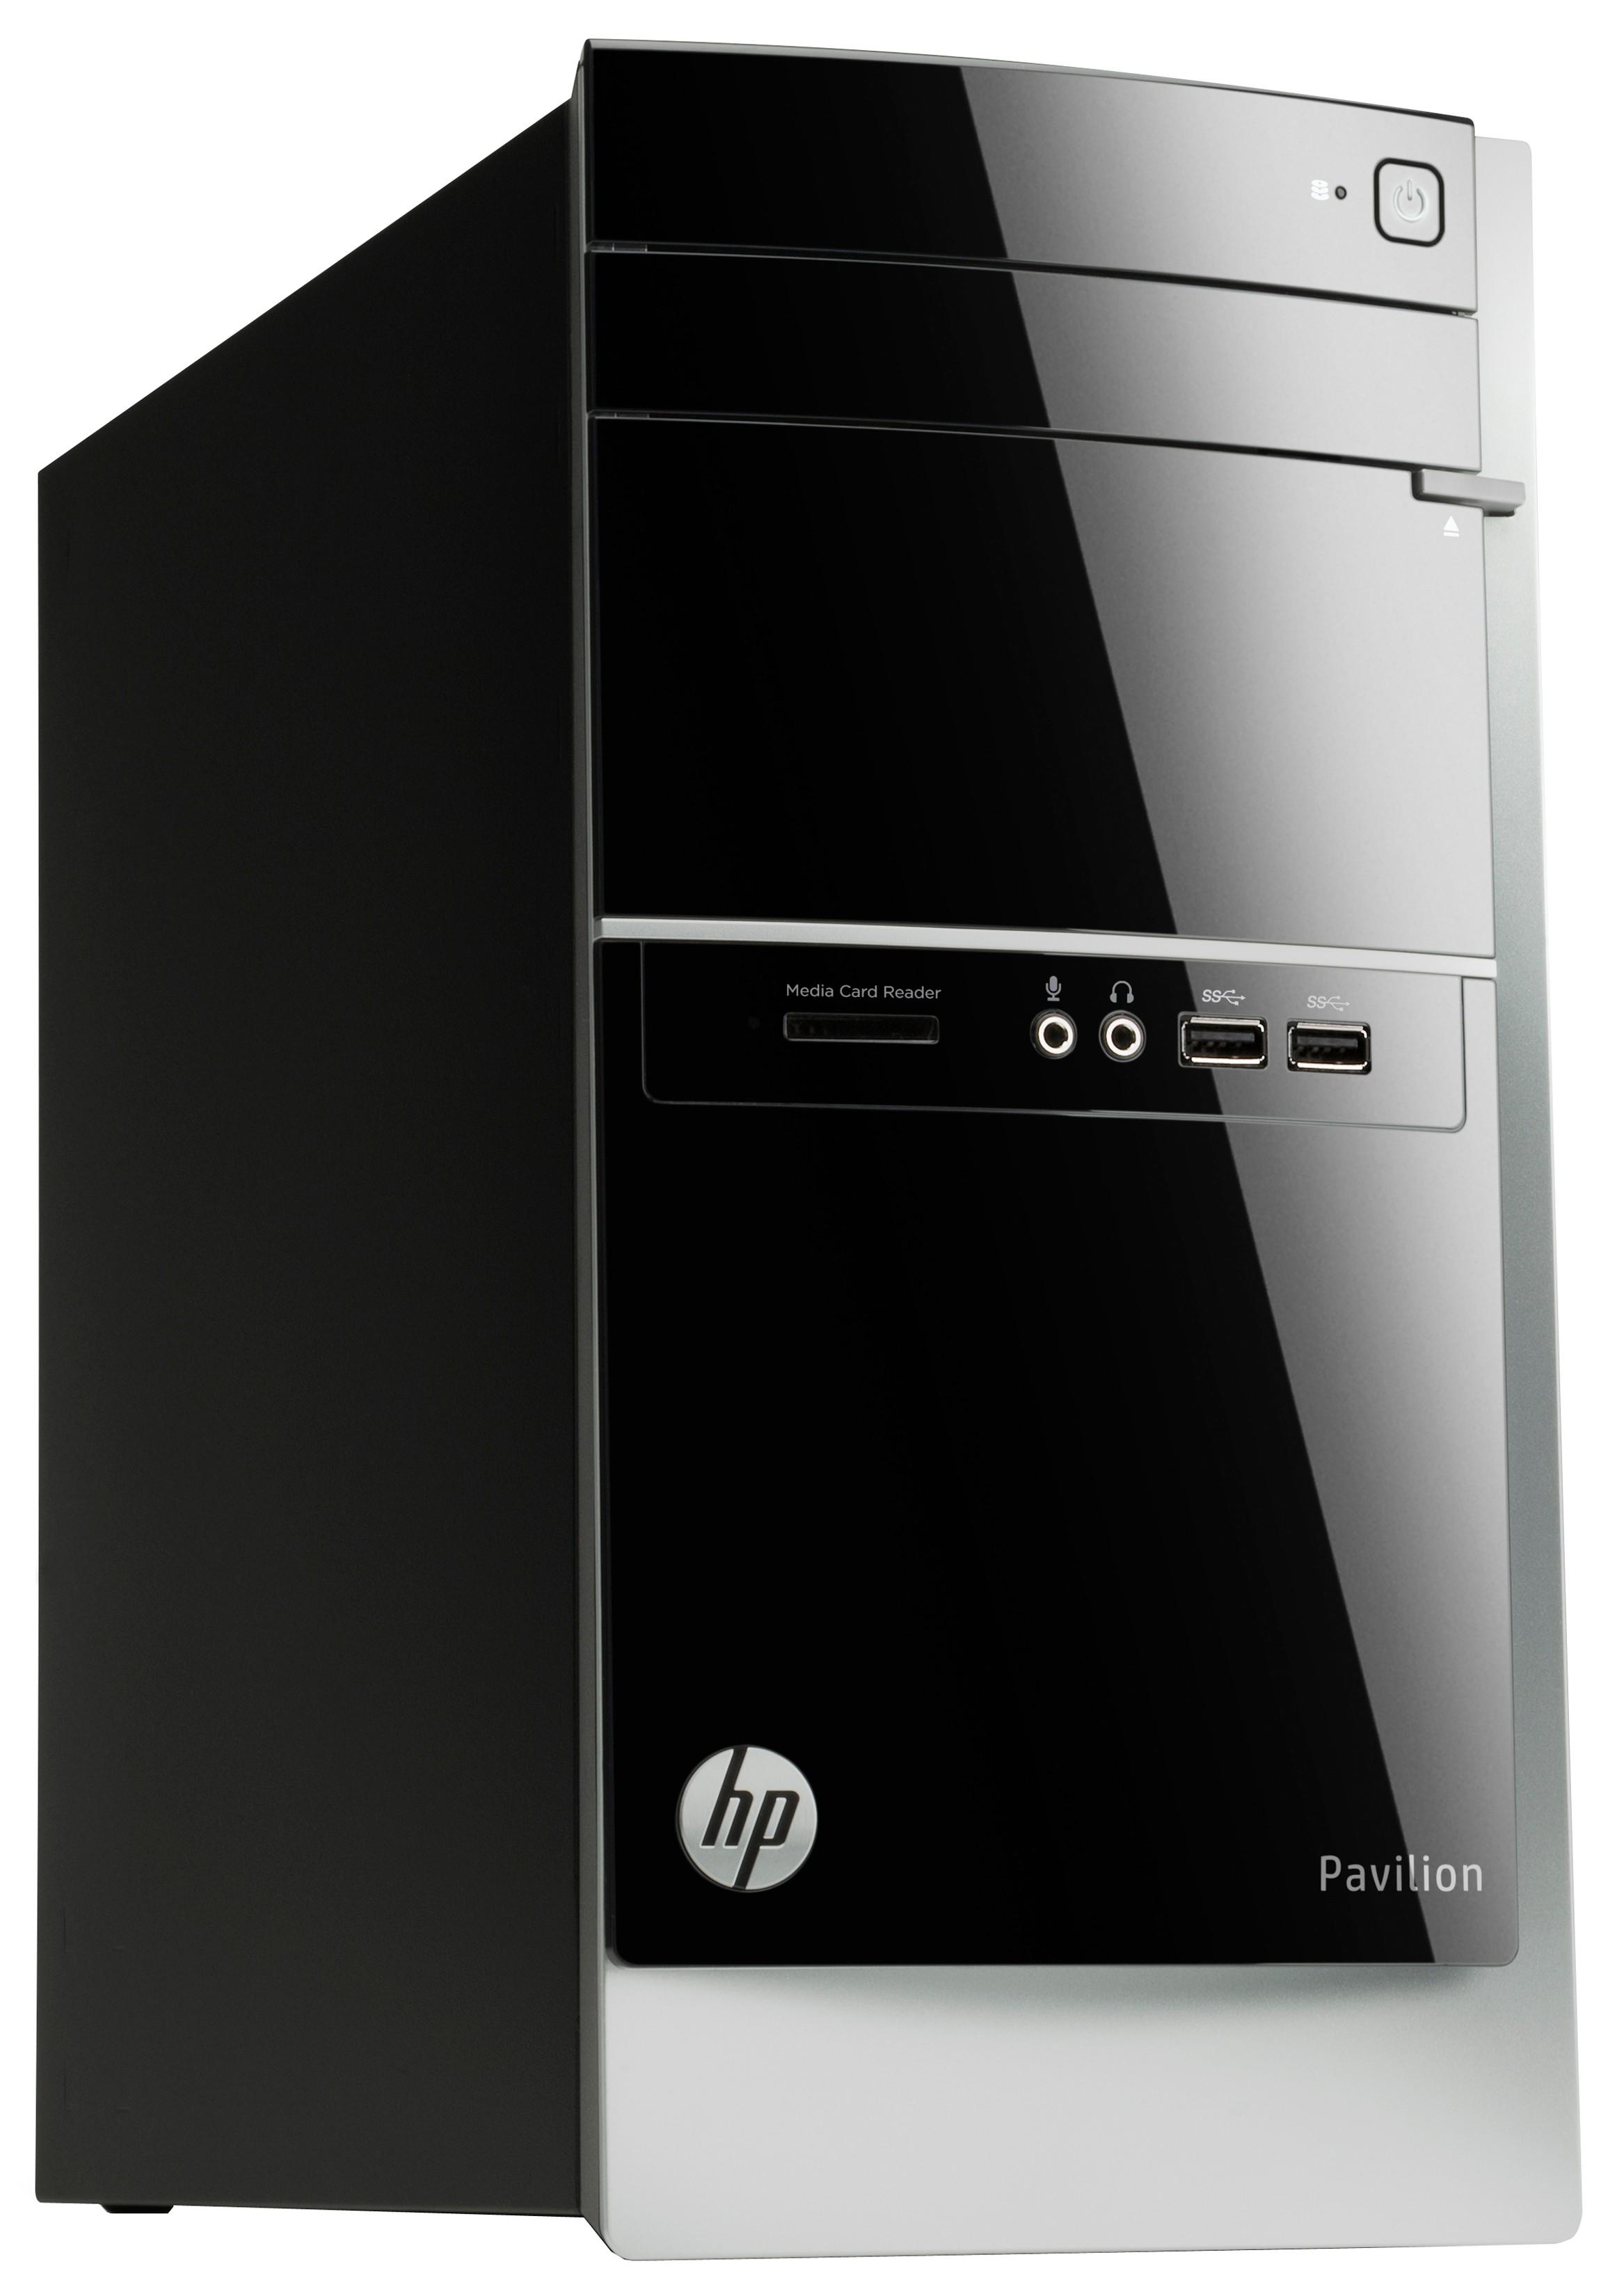 J2H79EA#UUW : HP Pavilion 500-312no stasjonær PC